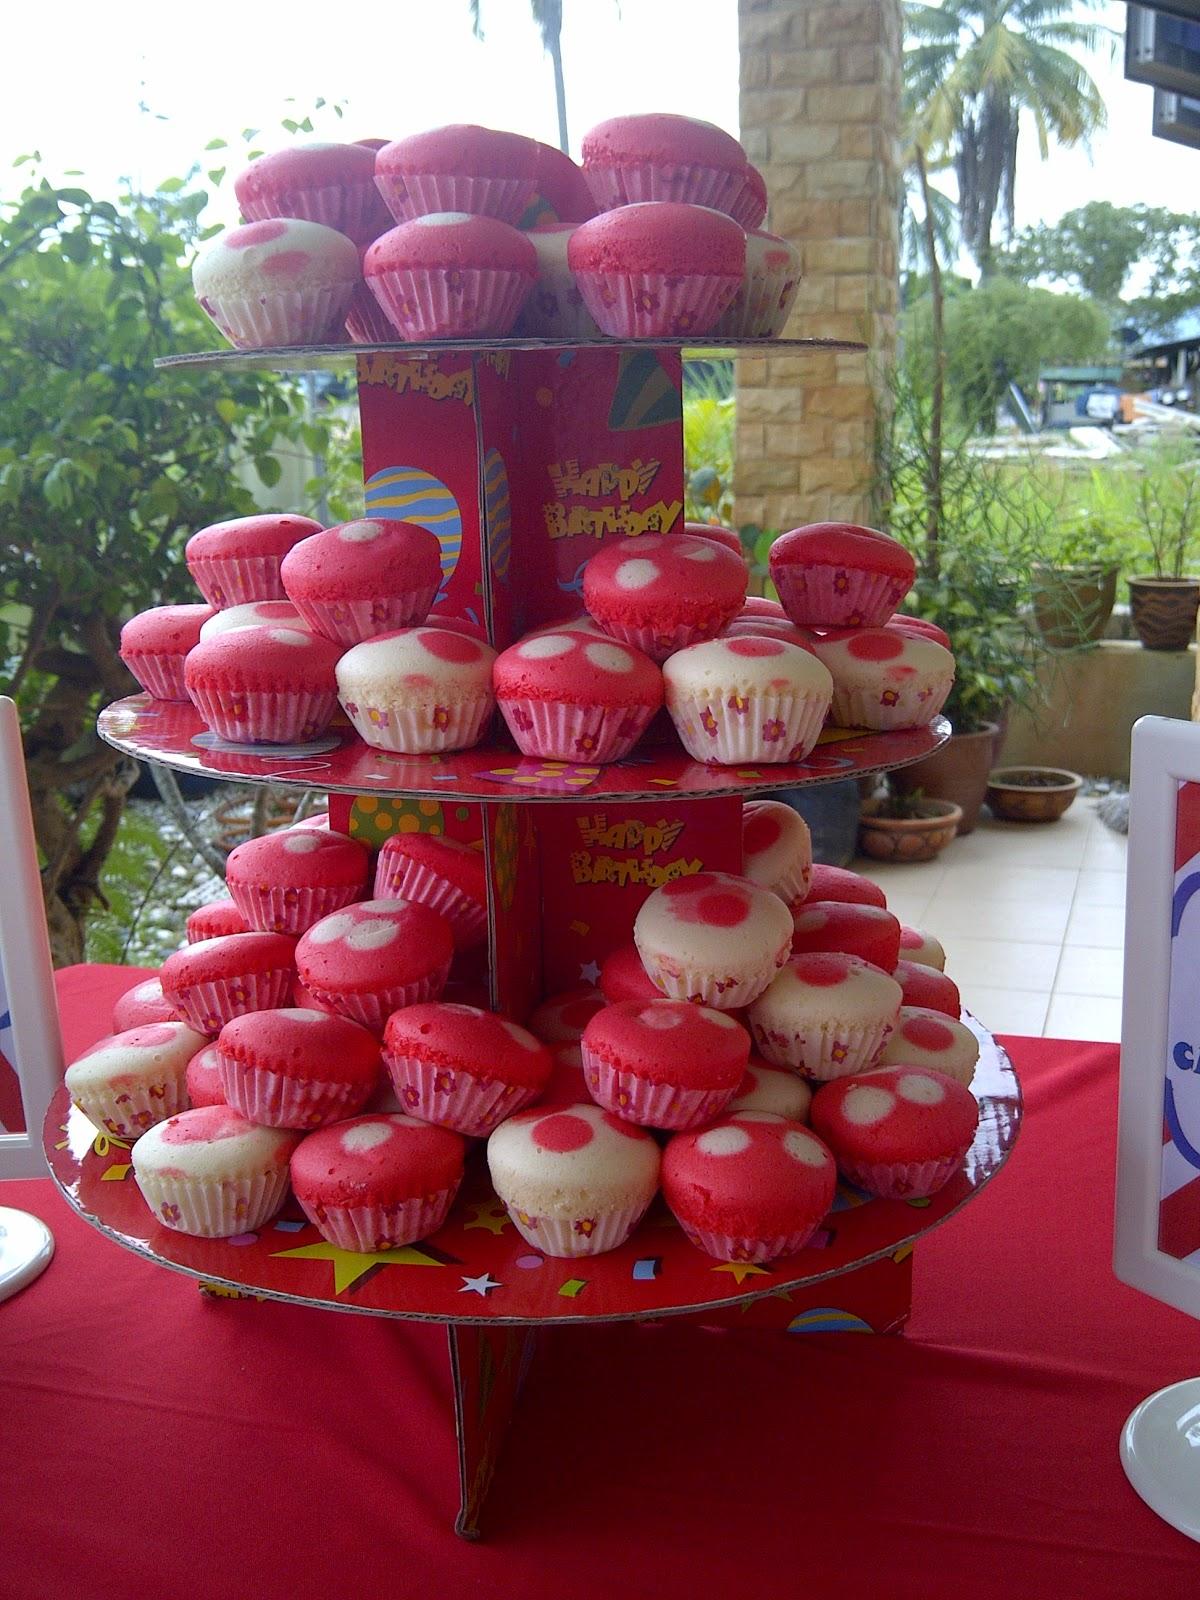 Birthday Decoration Kajang Image Inspiration of Cake and Birthday